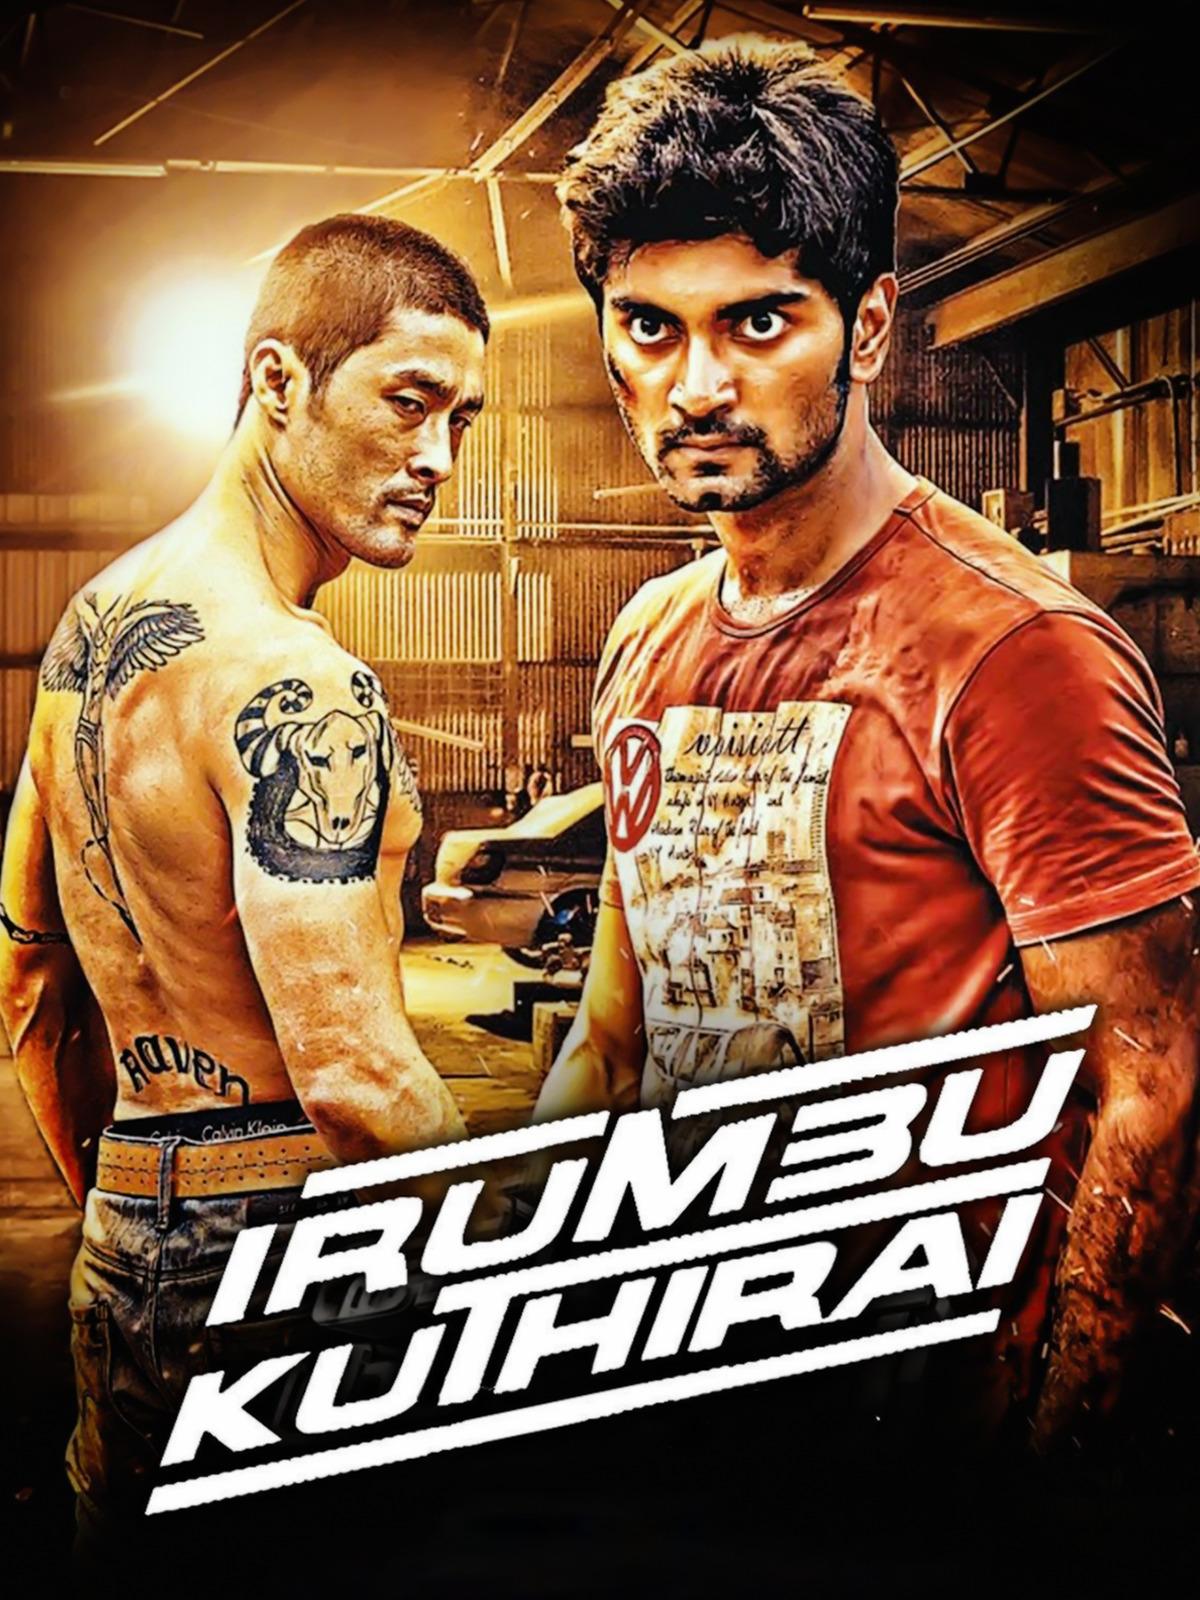 Dhoom Machale (Irumbu Kuthirai) 2020 Hindi Dubbed 720p HDRip 350MB Download